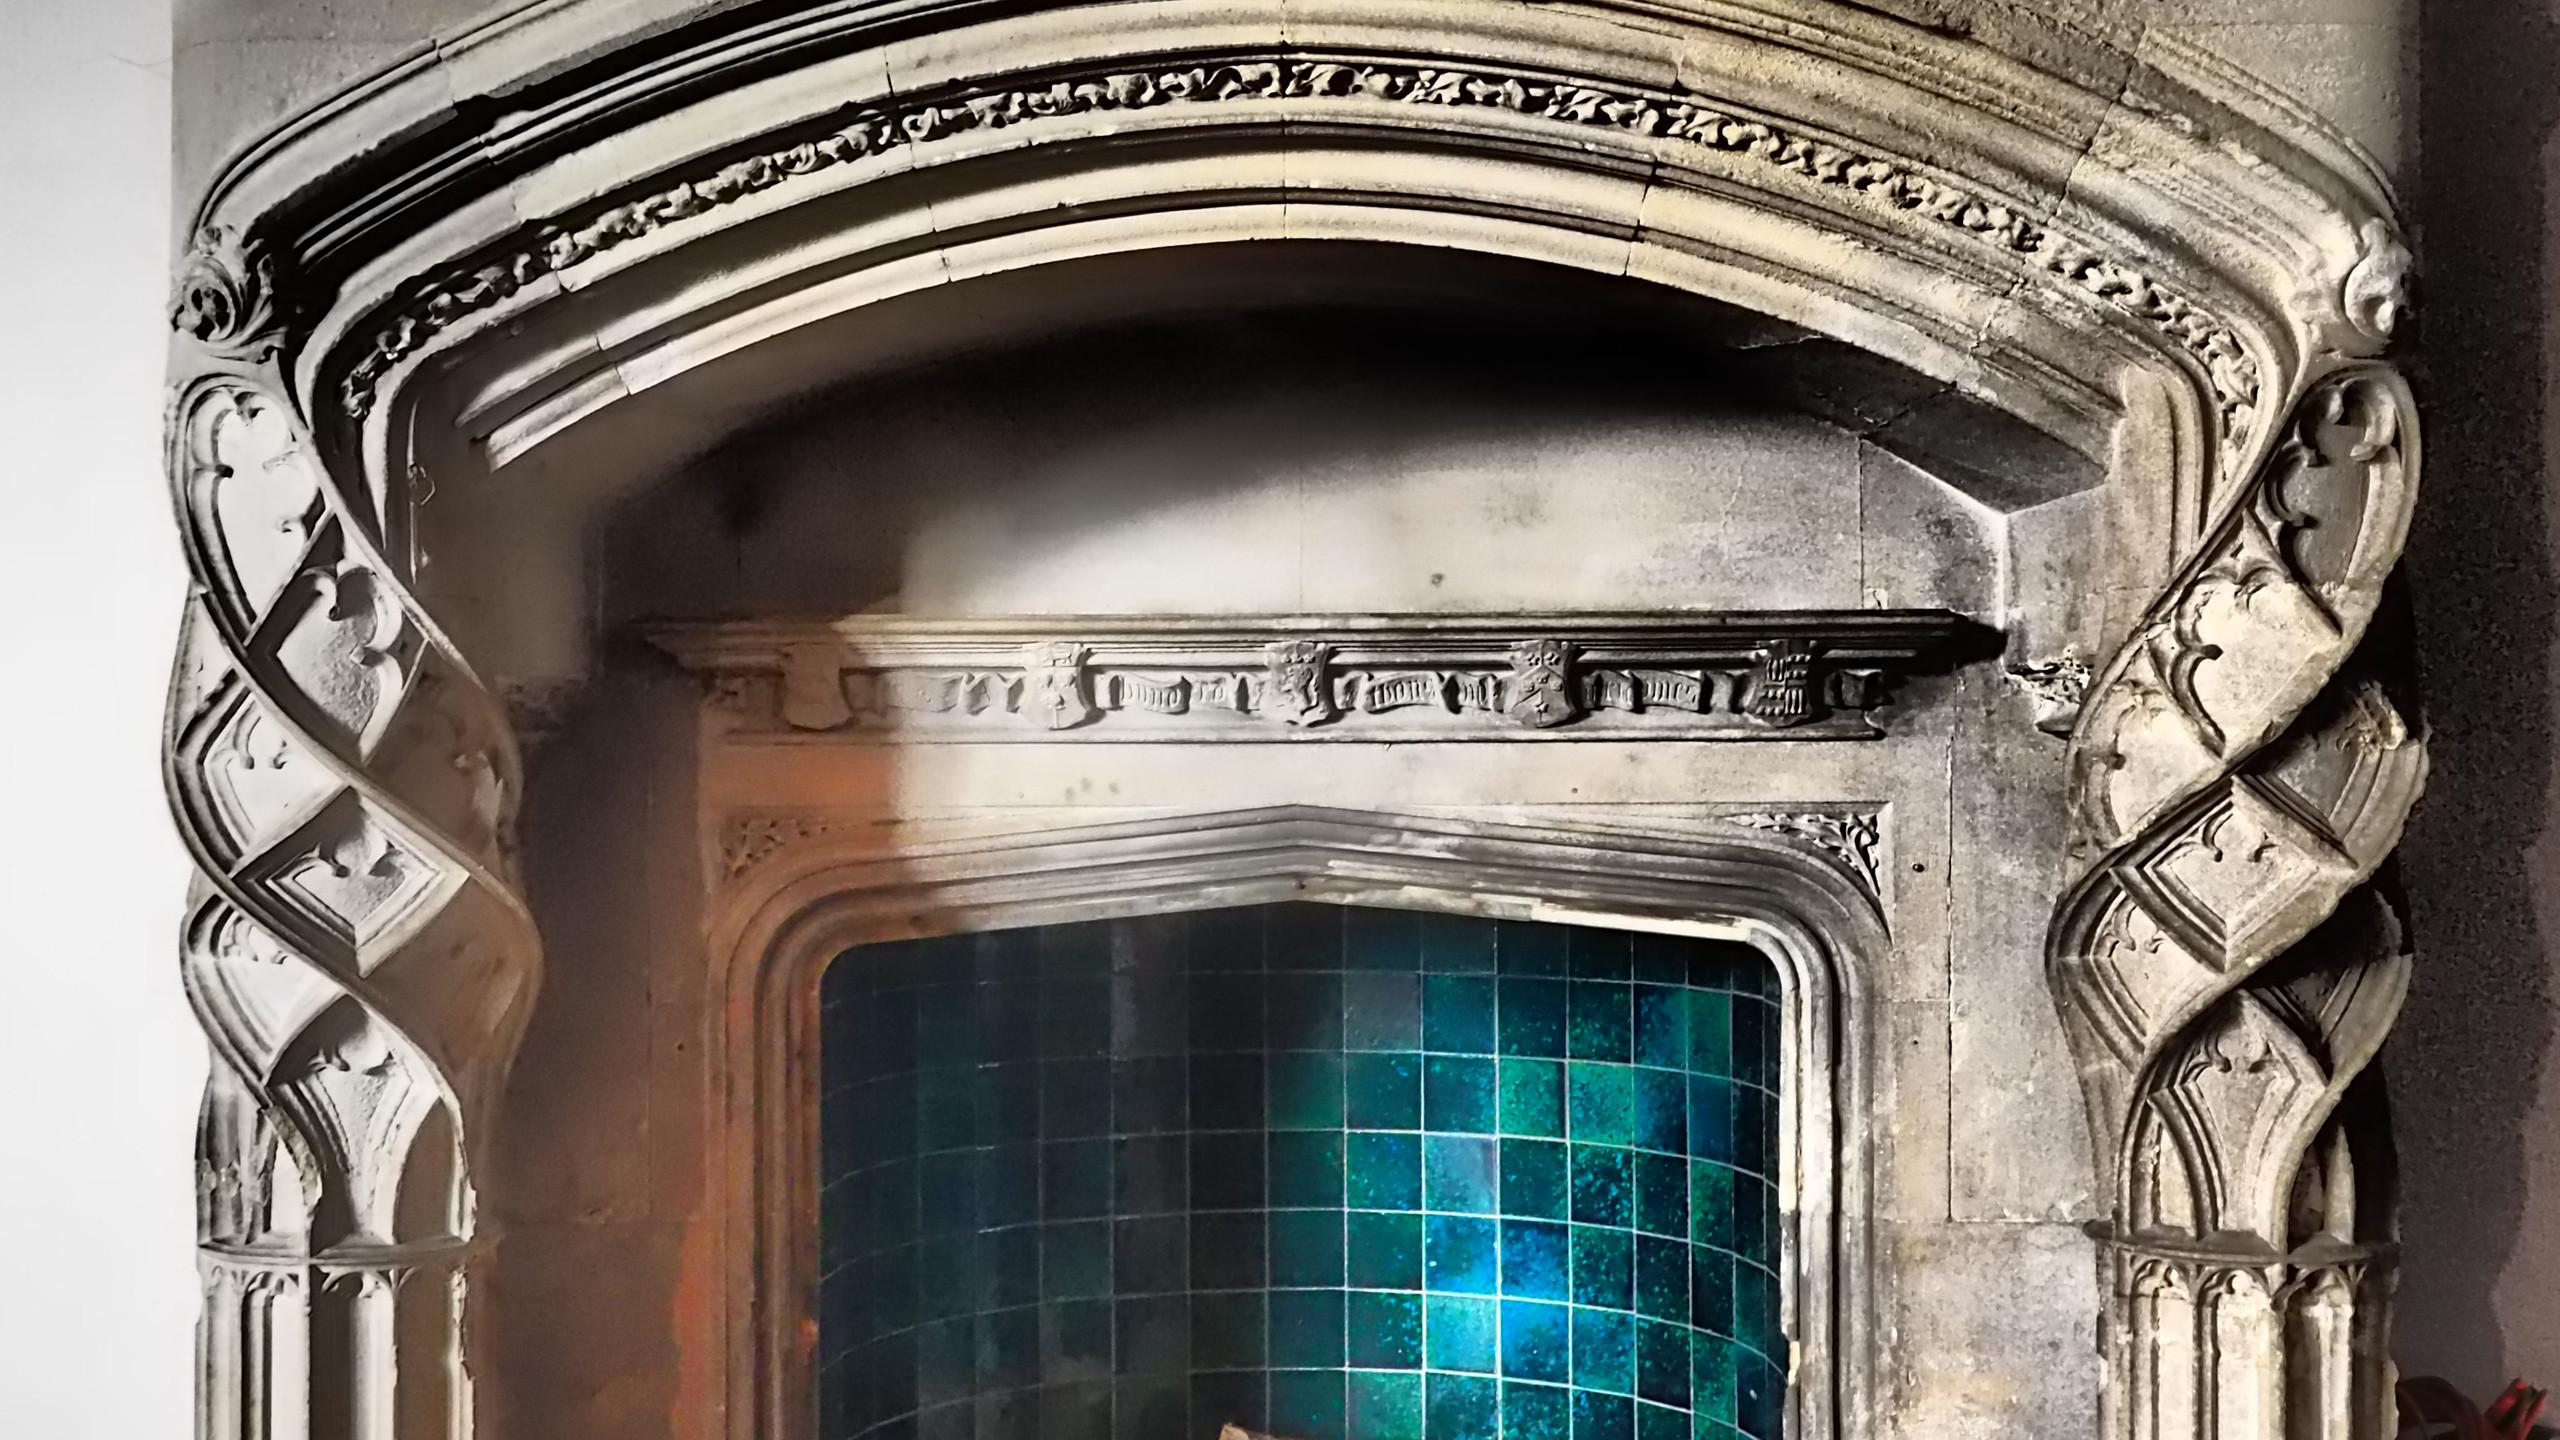 Amy Hutchings - Music Room Fireplace